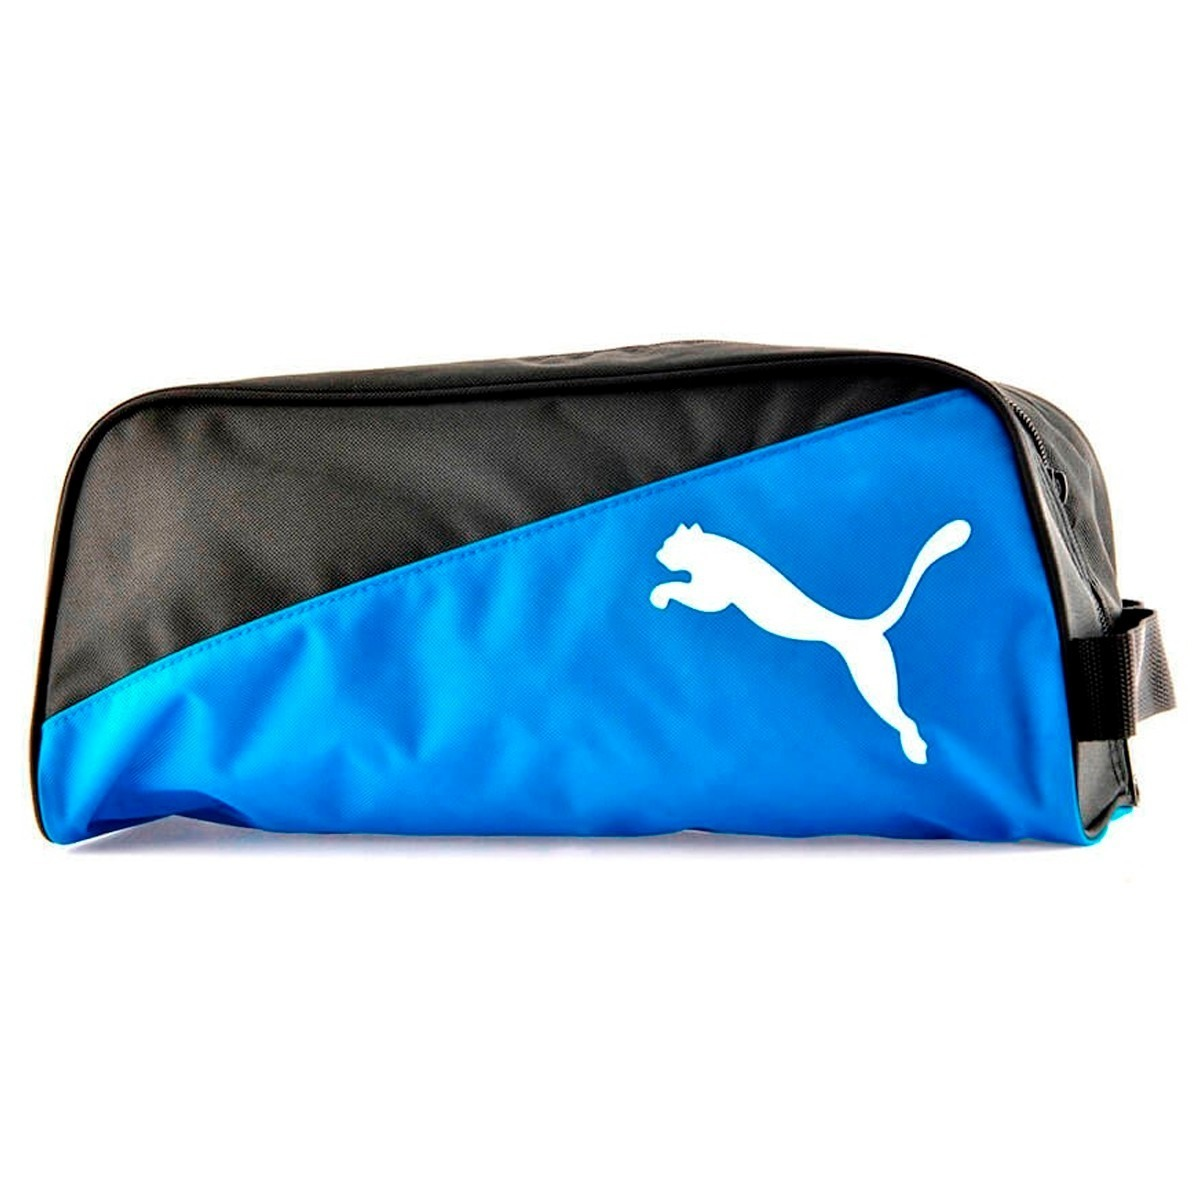 4eba685bd Zapatera Puma Shoebag Pro Training Original Bl/bk - $ 320.00 en ...